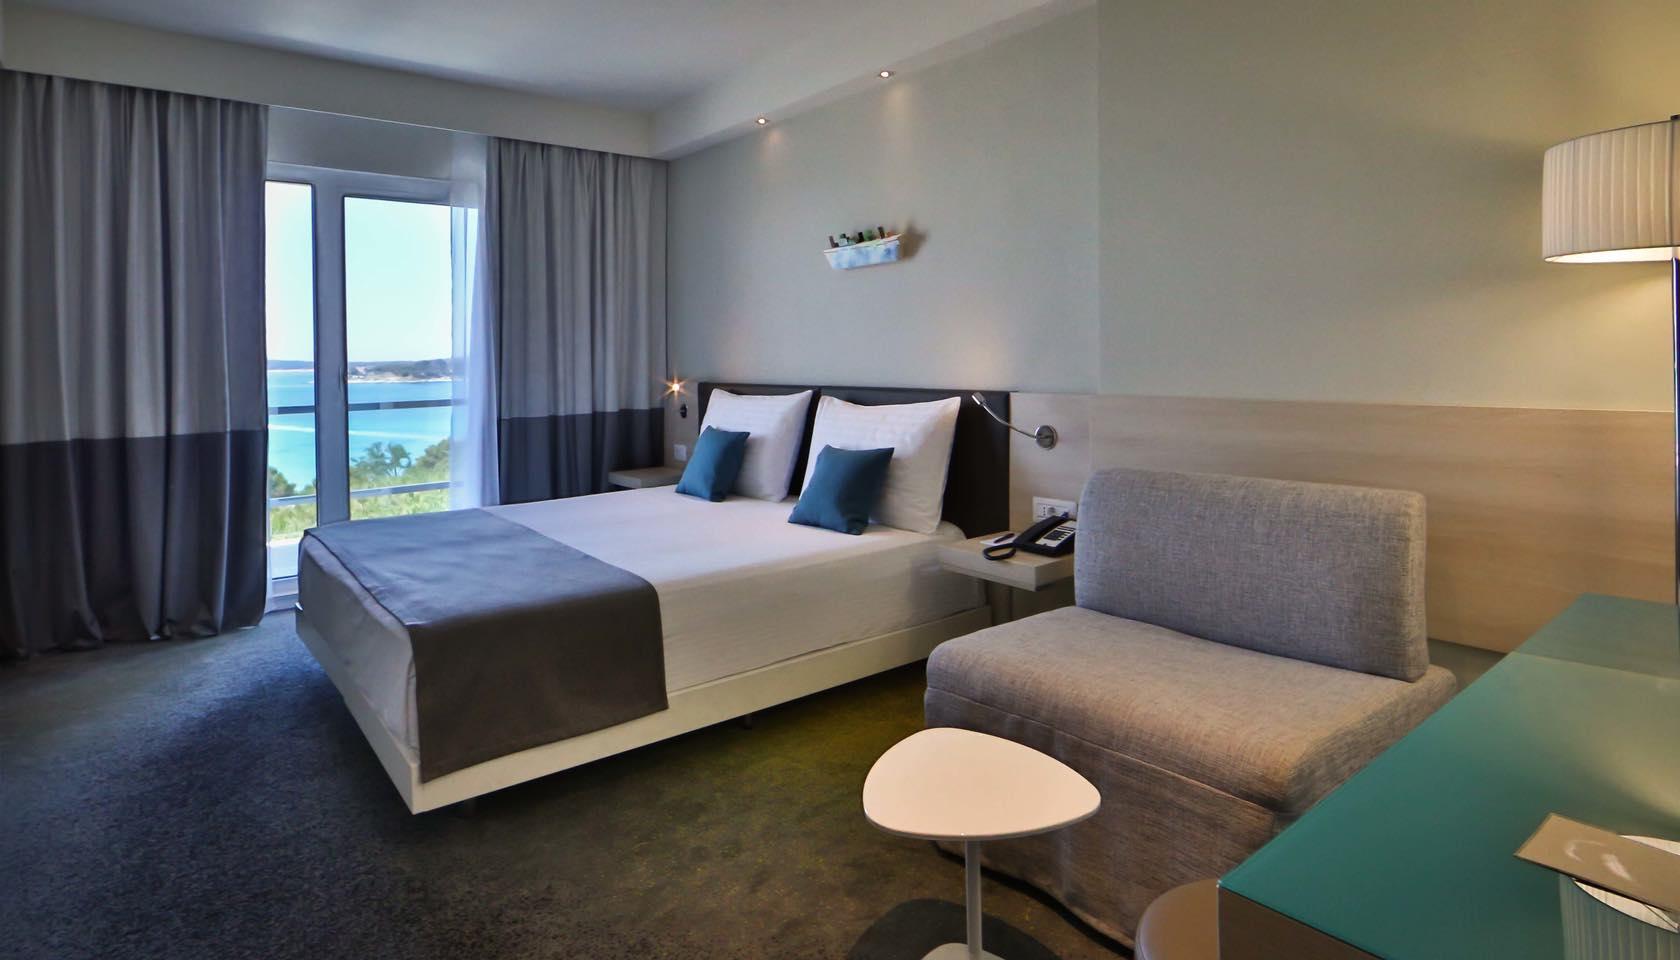 Hotel Park Plaza Belvedere - Medulin Hotel